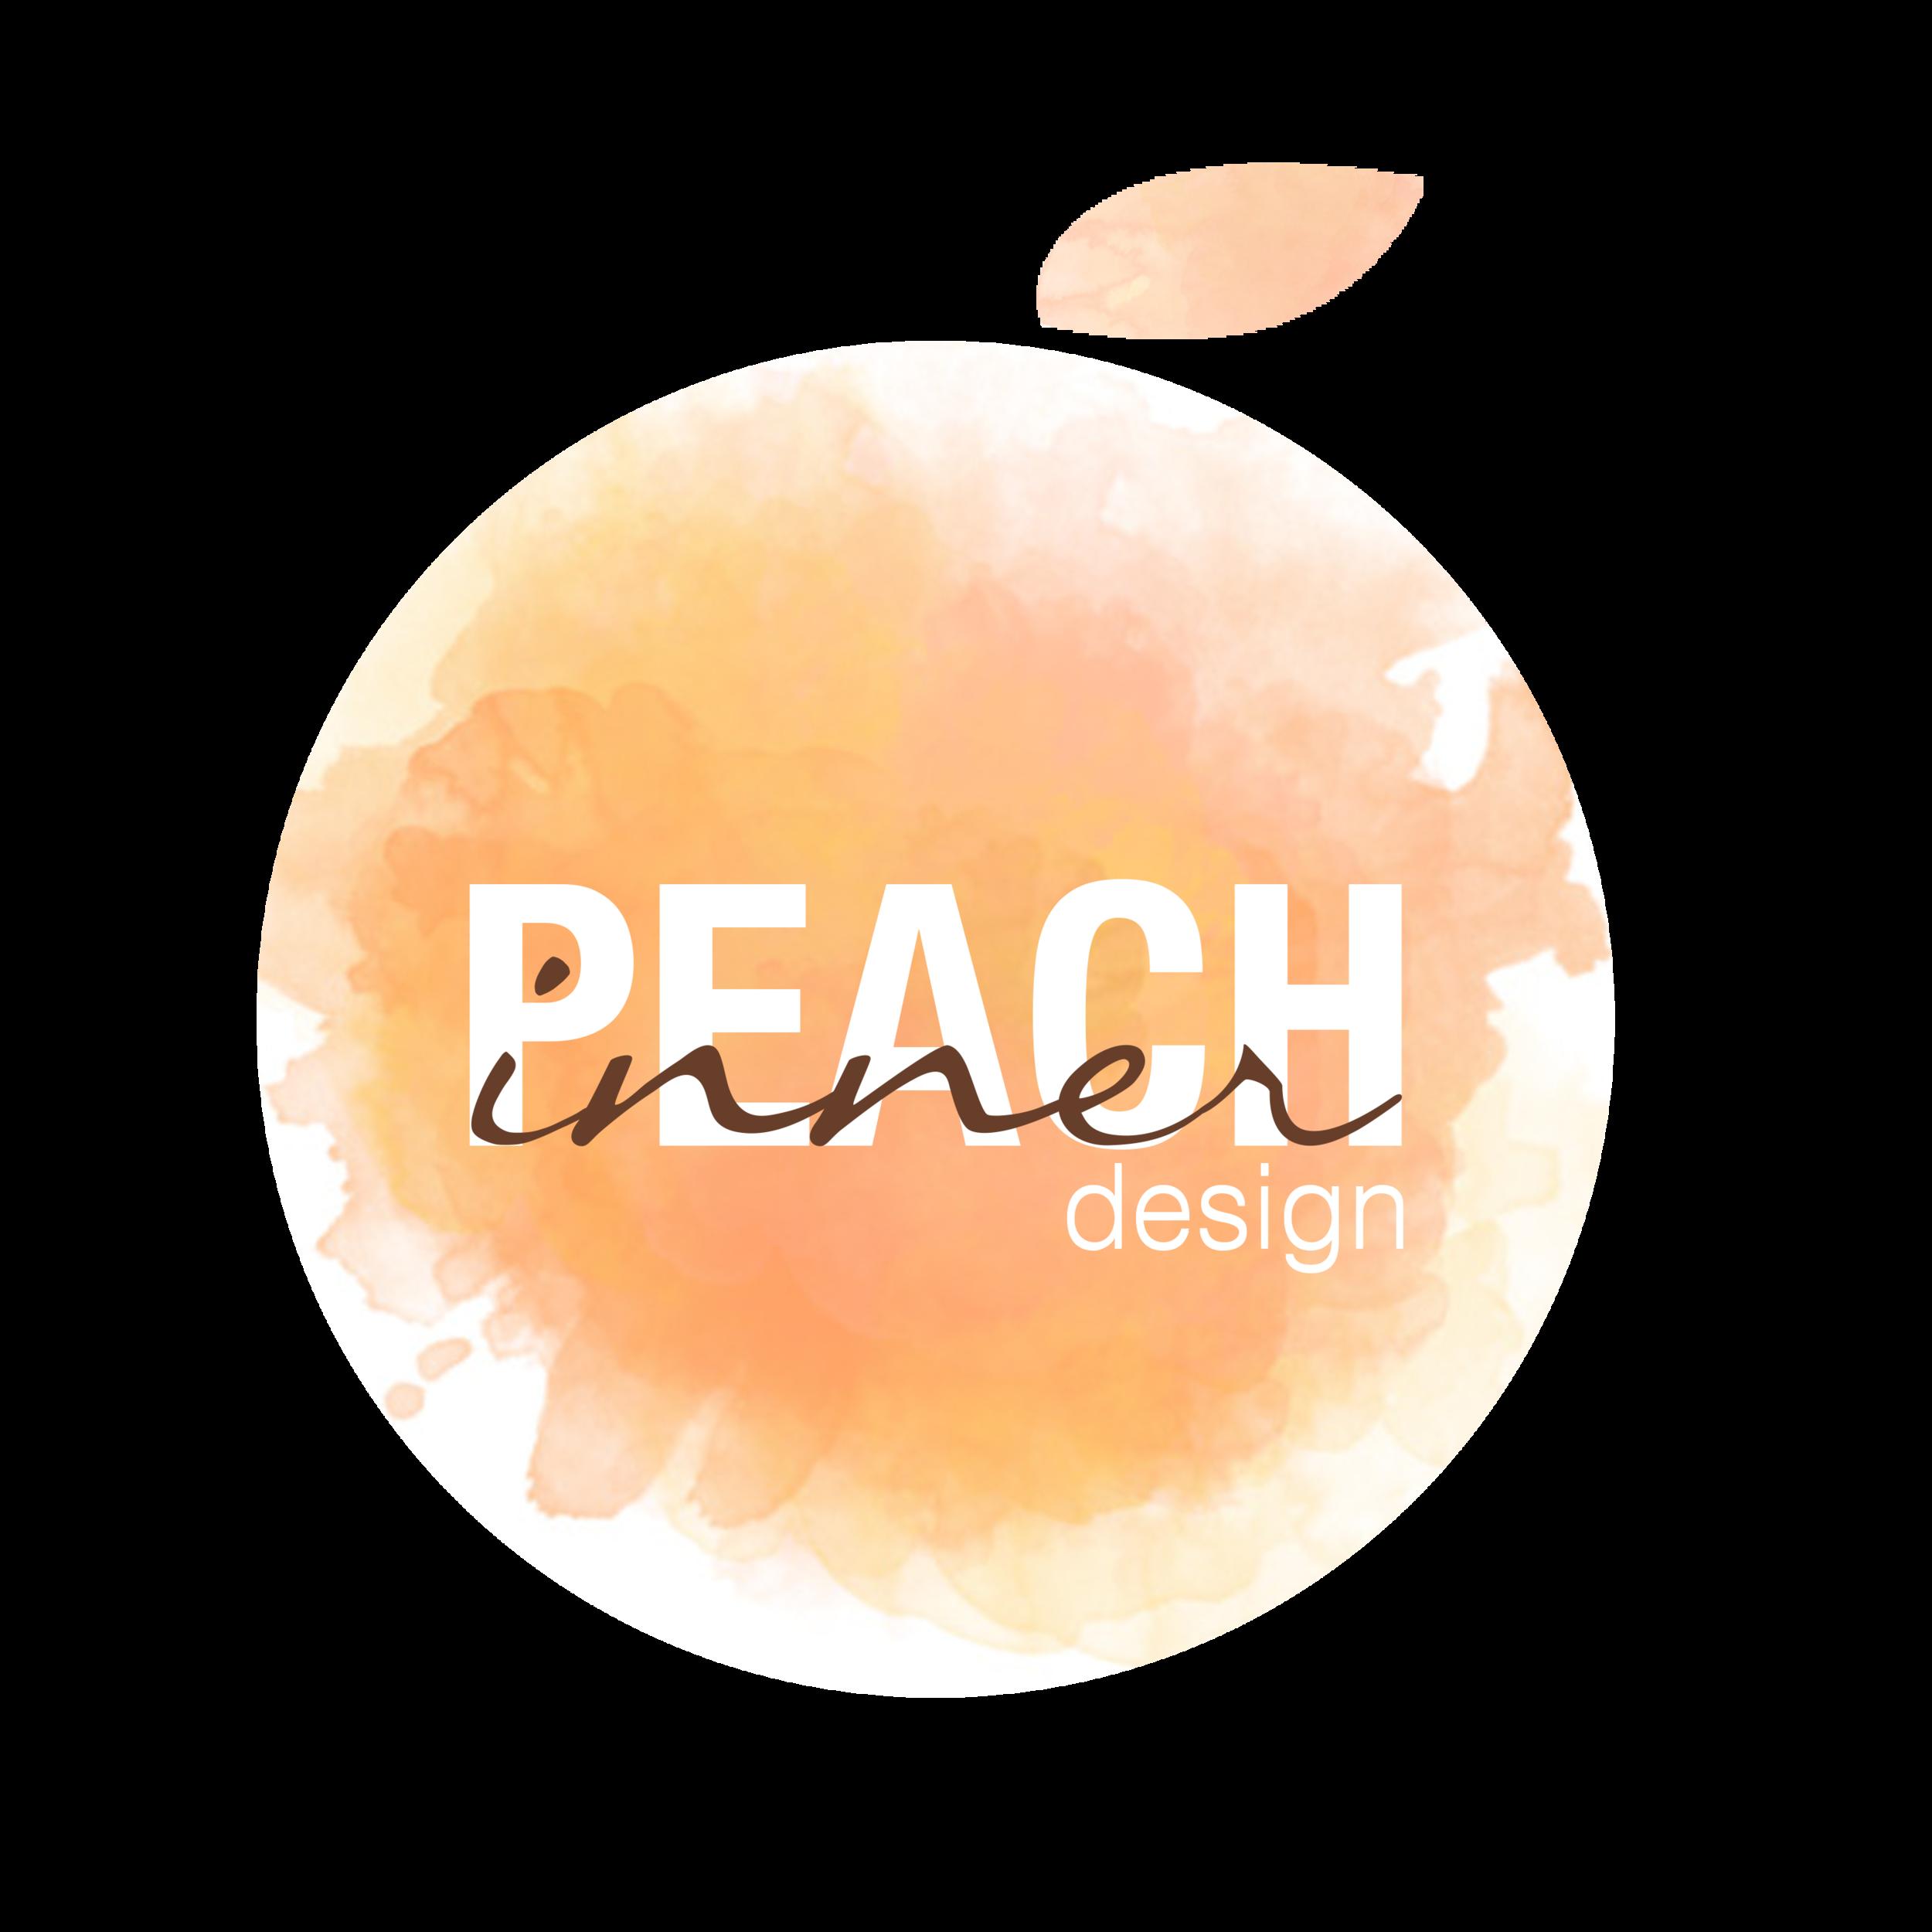 innerpeach logo bigger file.png